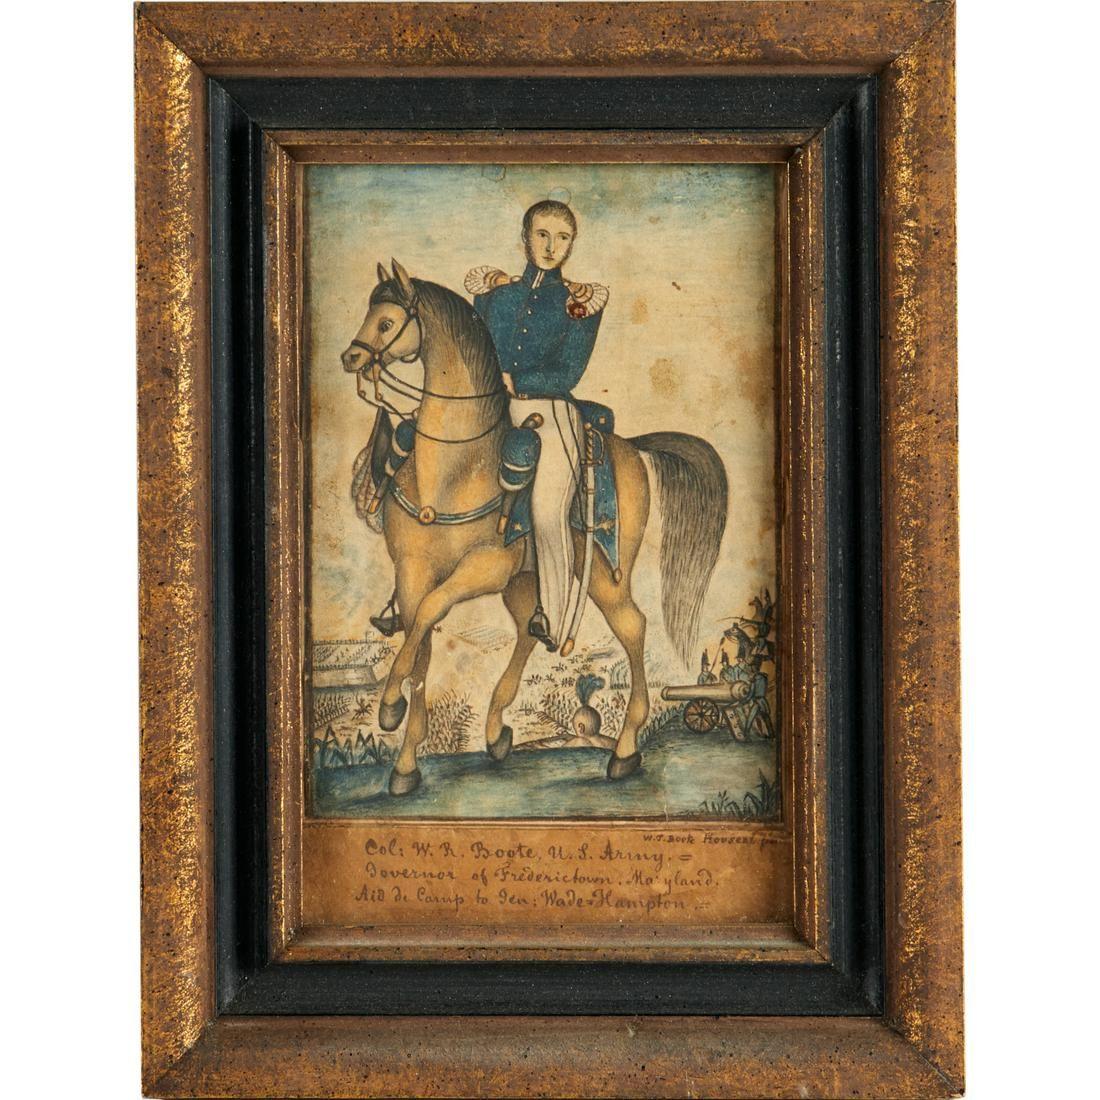 Folk Art painting, U.S. military officer, 19th c.